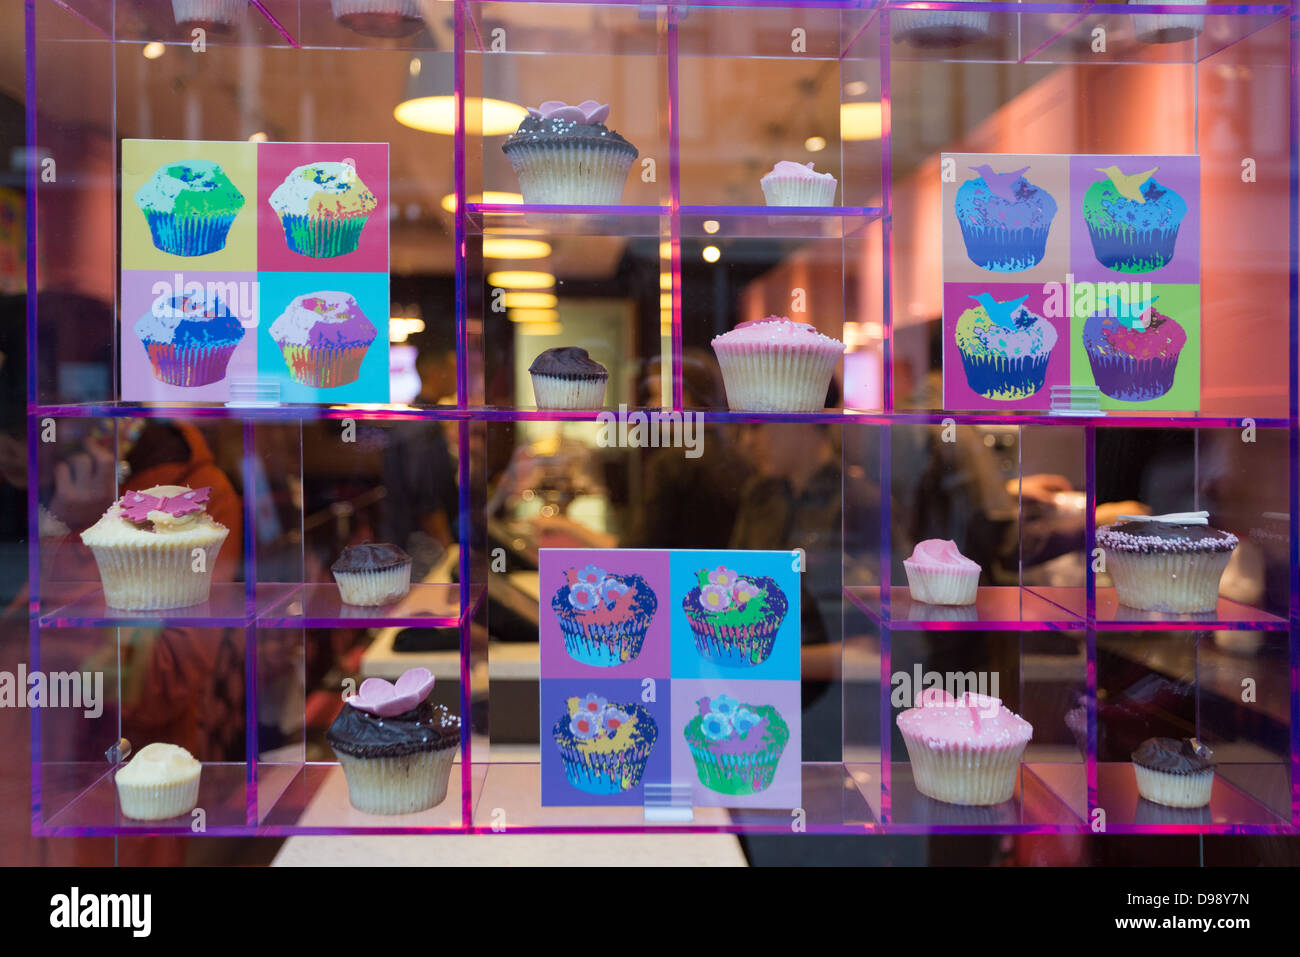 Shop window display showing traditional cupcakes, Wardour street, London, United Kingdom - Stock Image